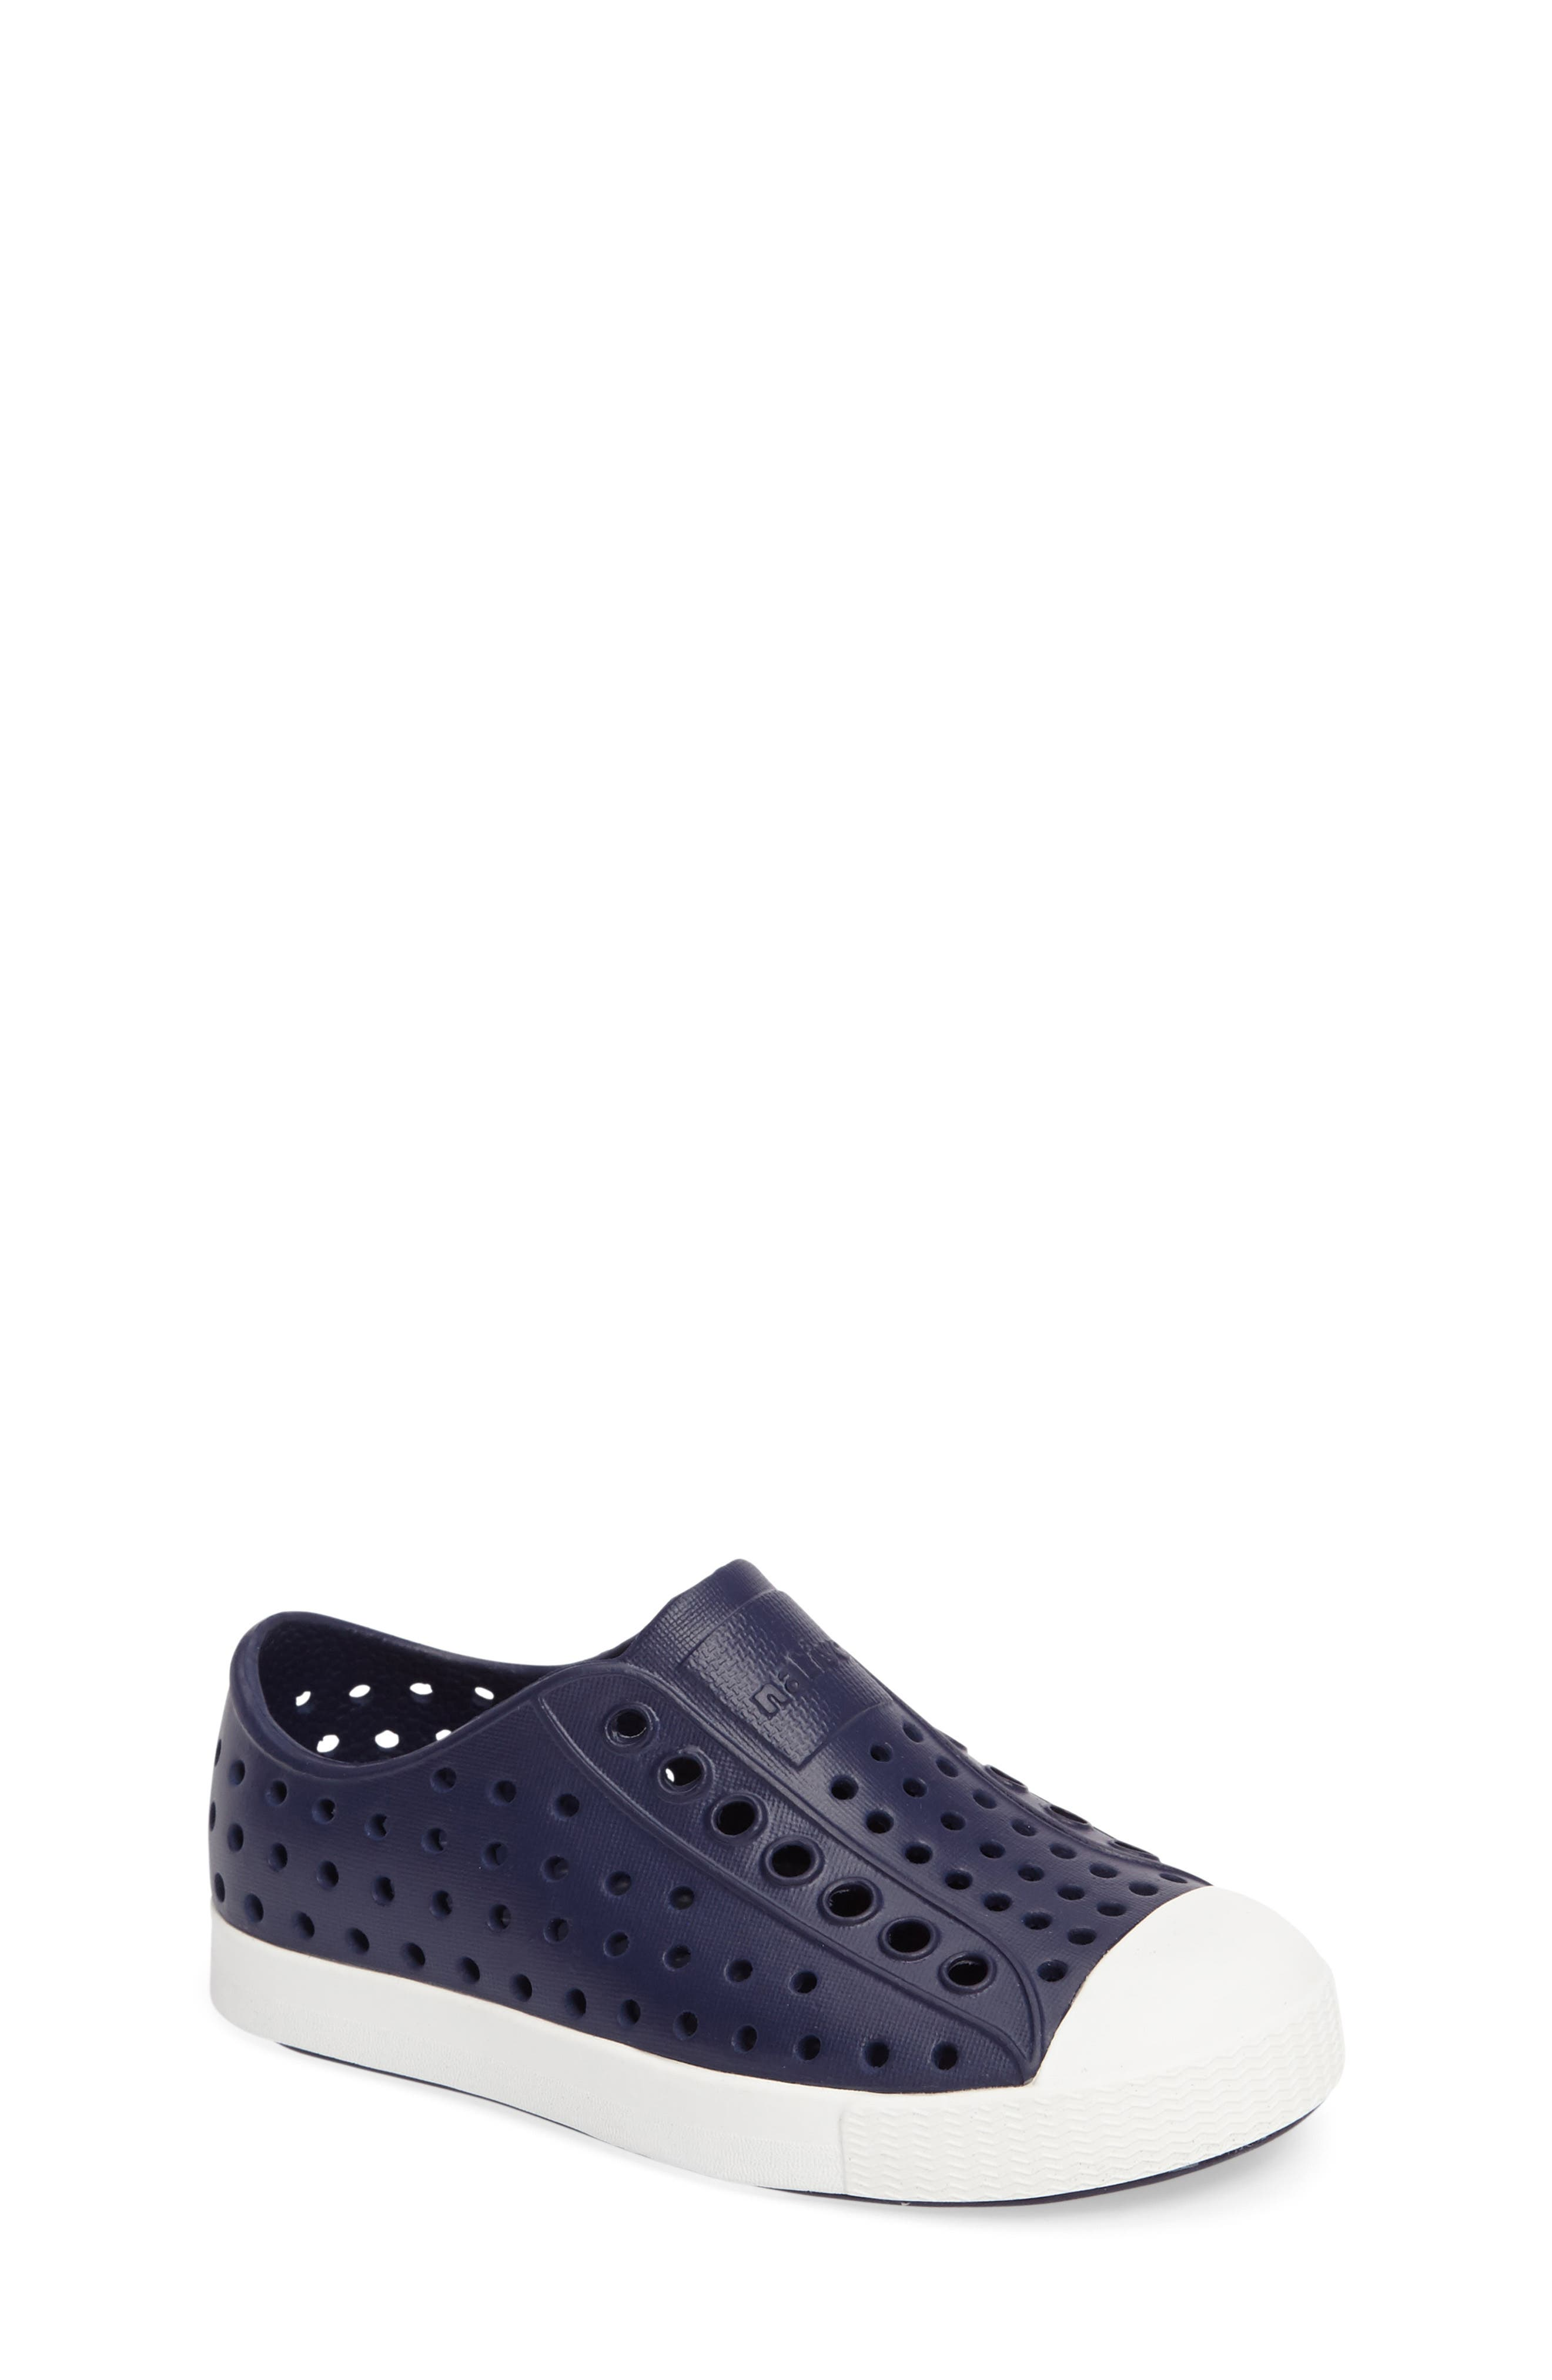 NATIVE SHOES,                             Jefferson Water Friendly Slip-On Vegan Sneaker,                             Main thumbnail 1, color,                             REGATTA BLUE/ SHELL WHITE